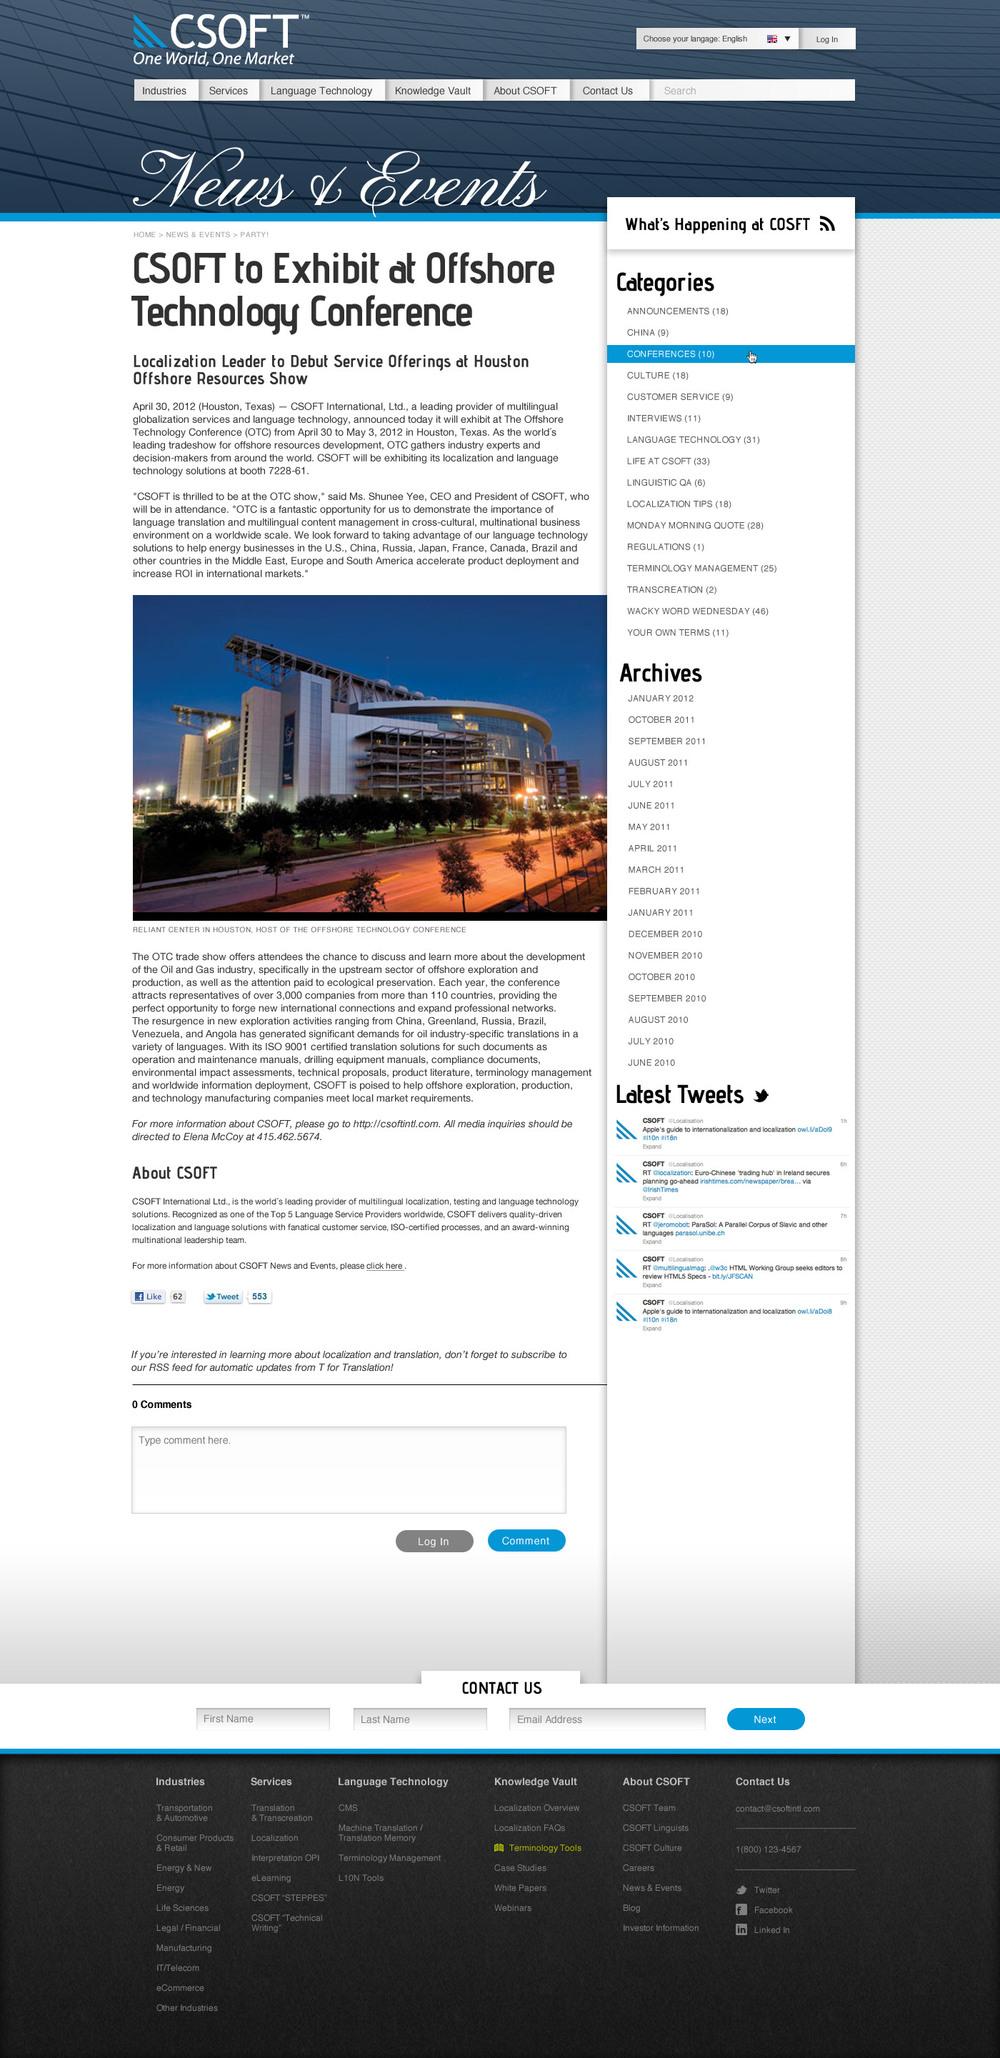 CSOFT-News-Events-List.jpg